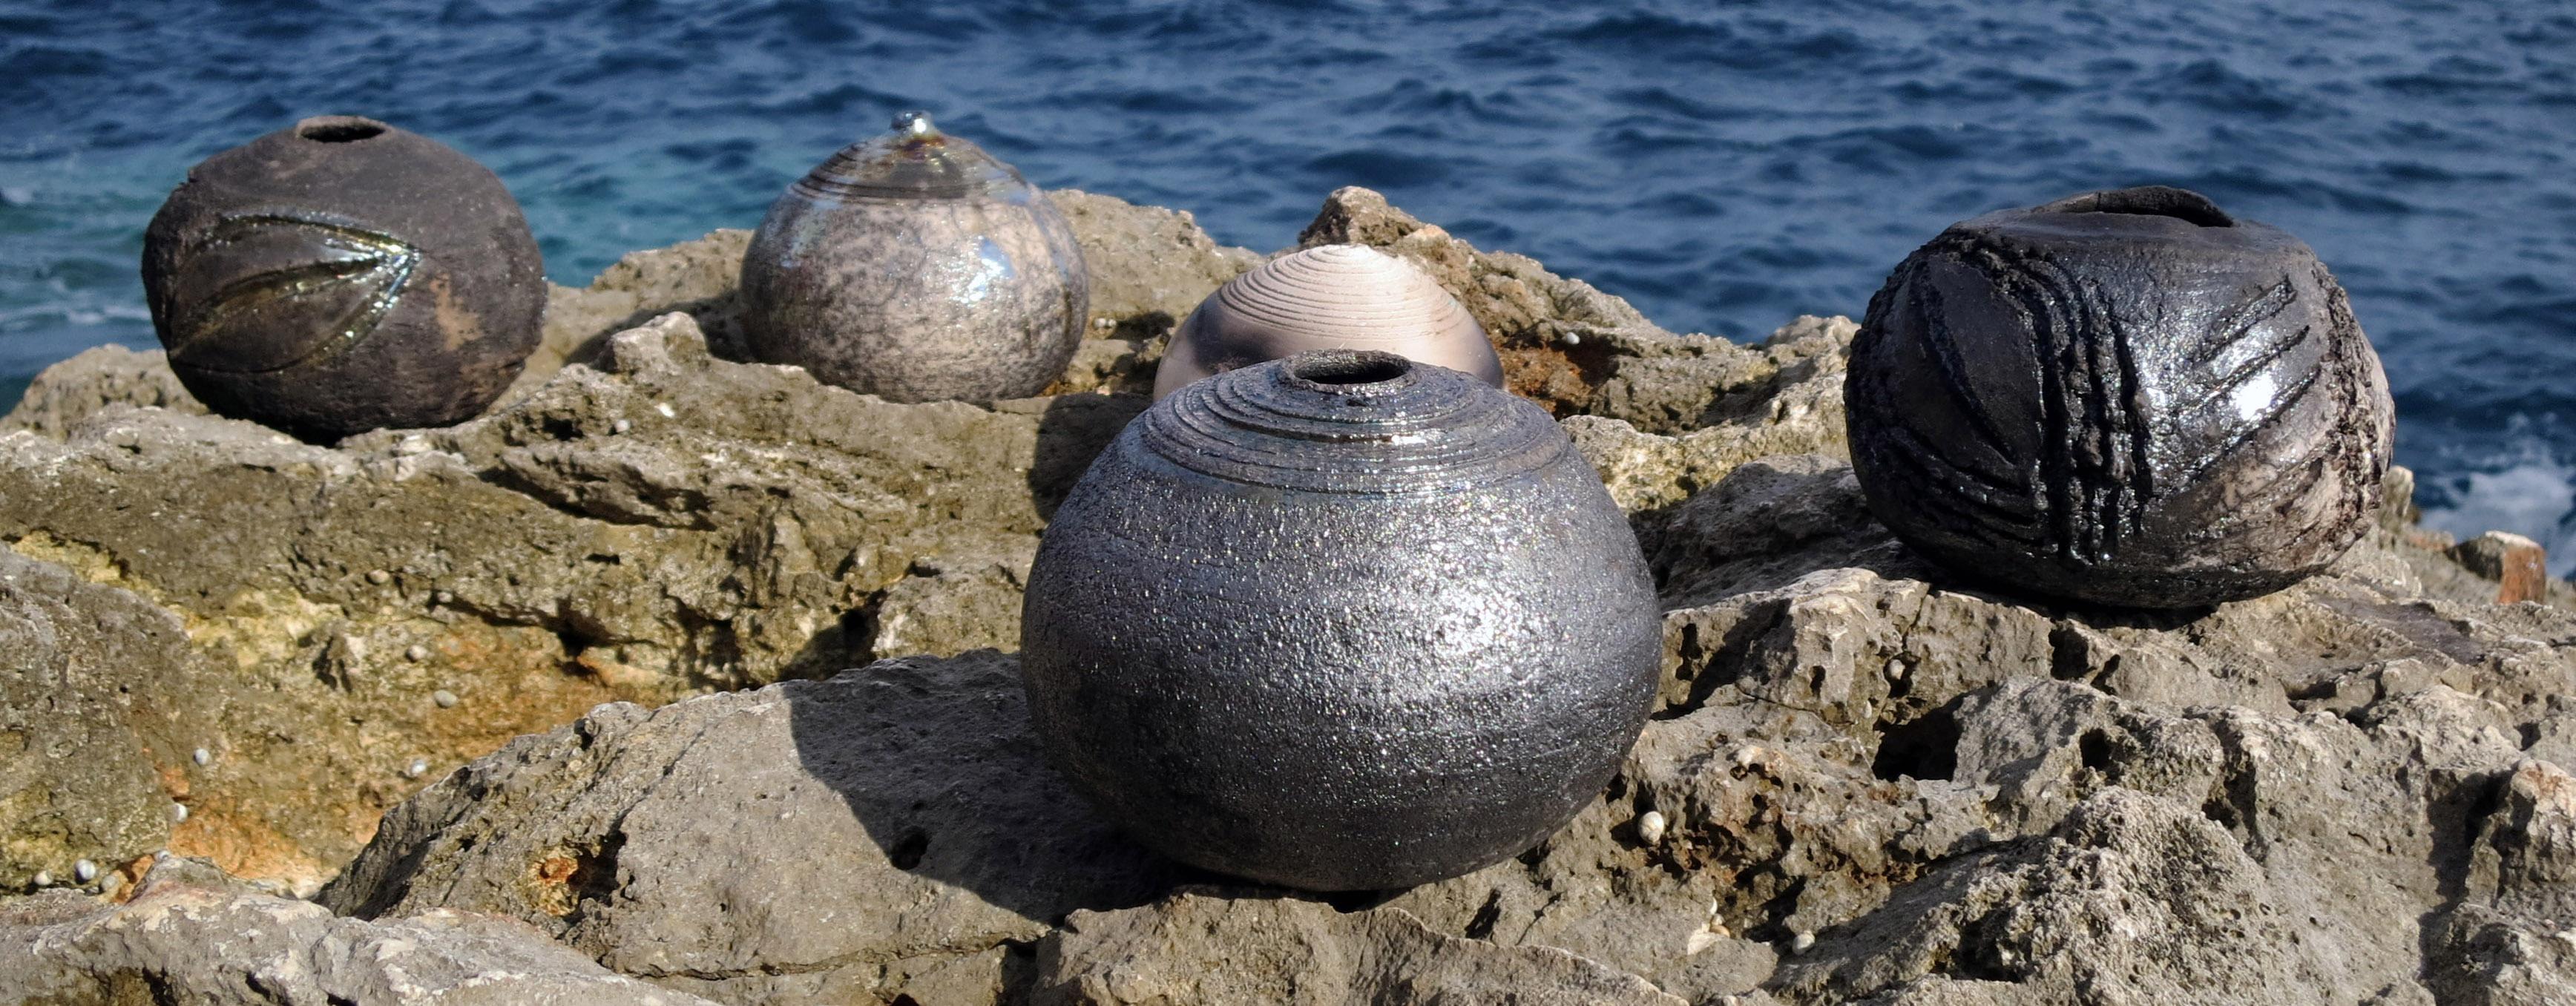 Whispering Globes from the Salento Series - Ildikó Károlyi